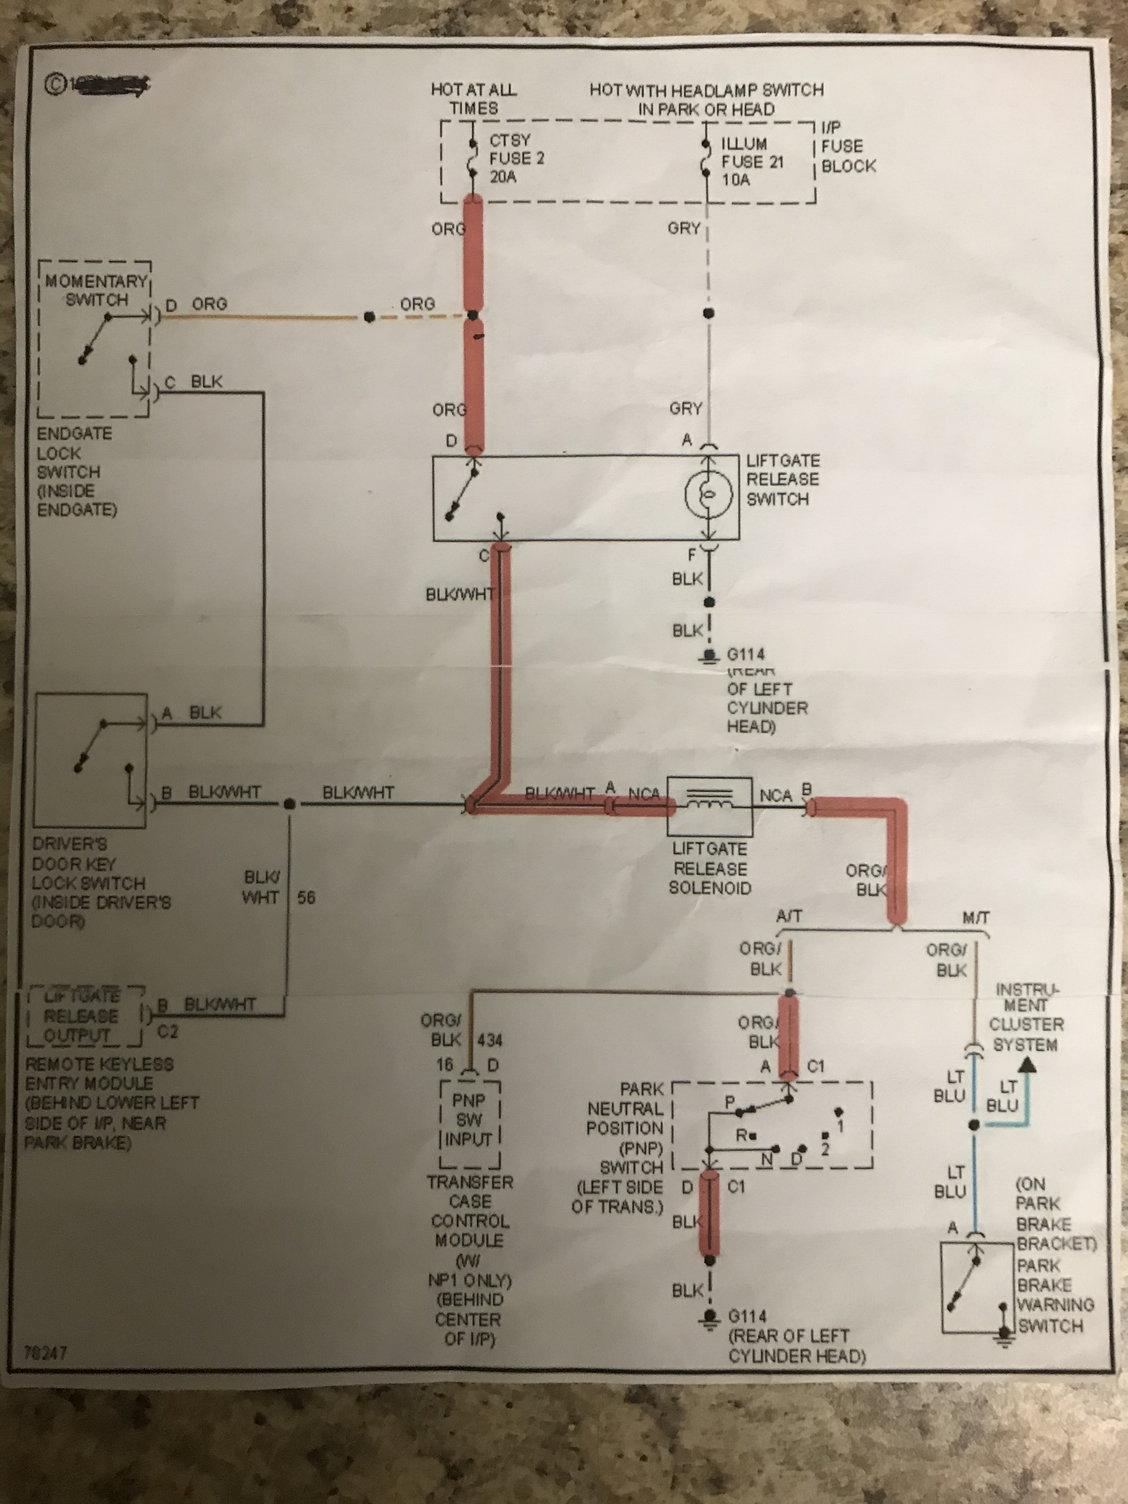 Endgate Lock  Release Wire Diagram - Blazer Forum